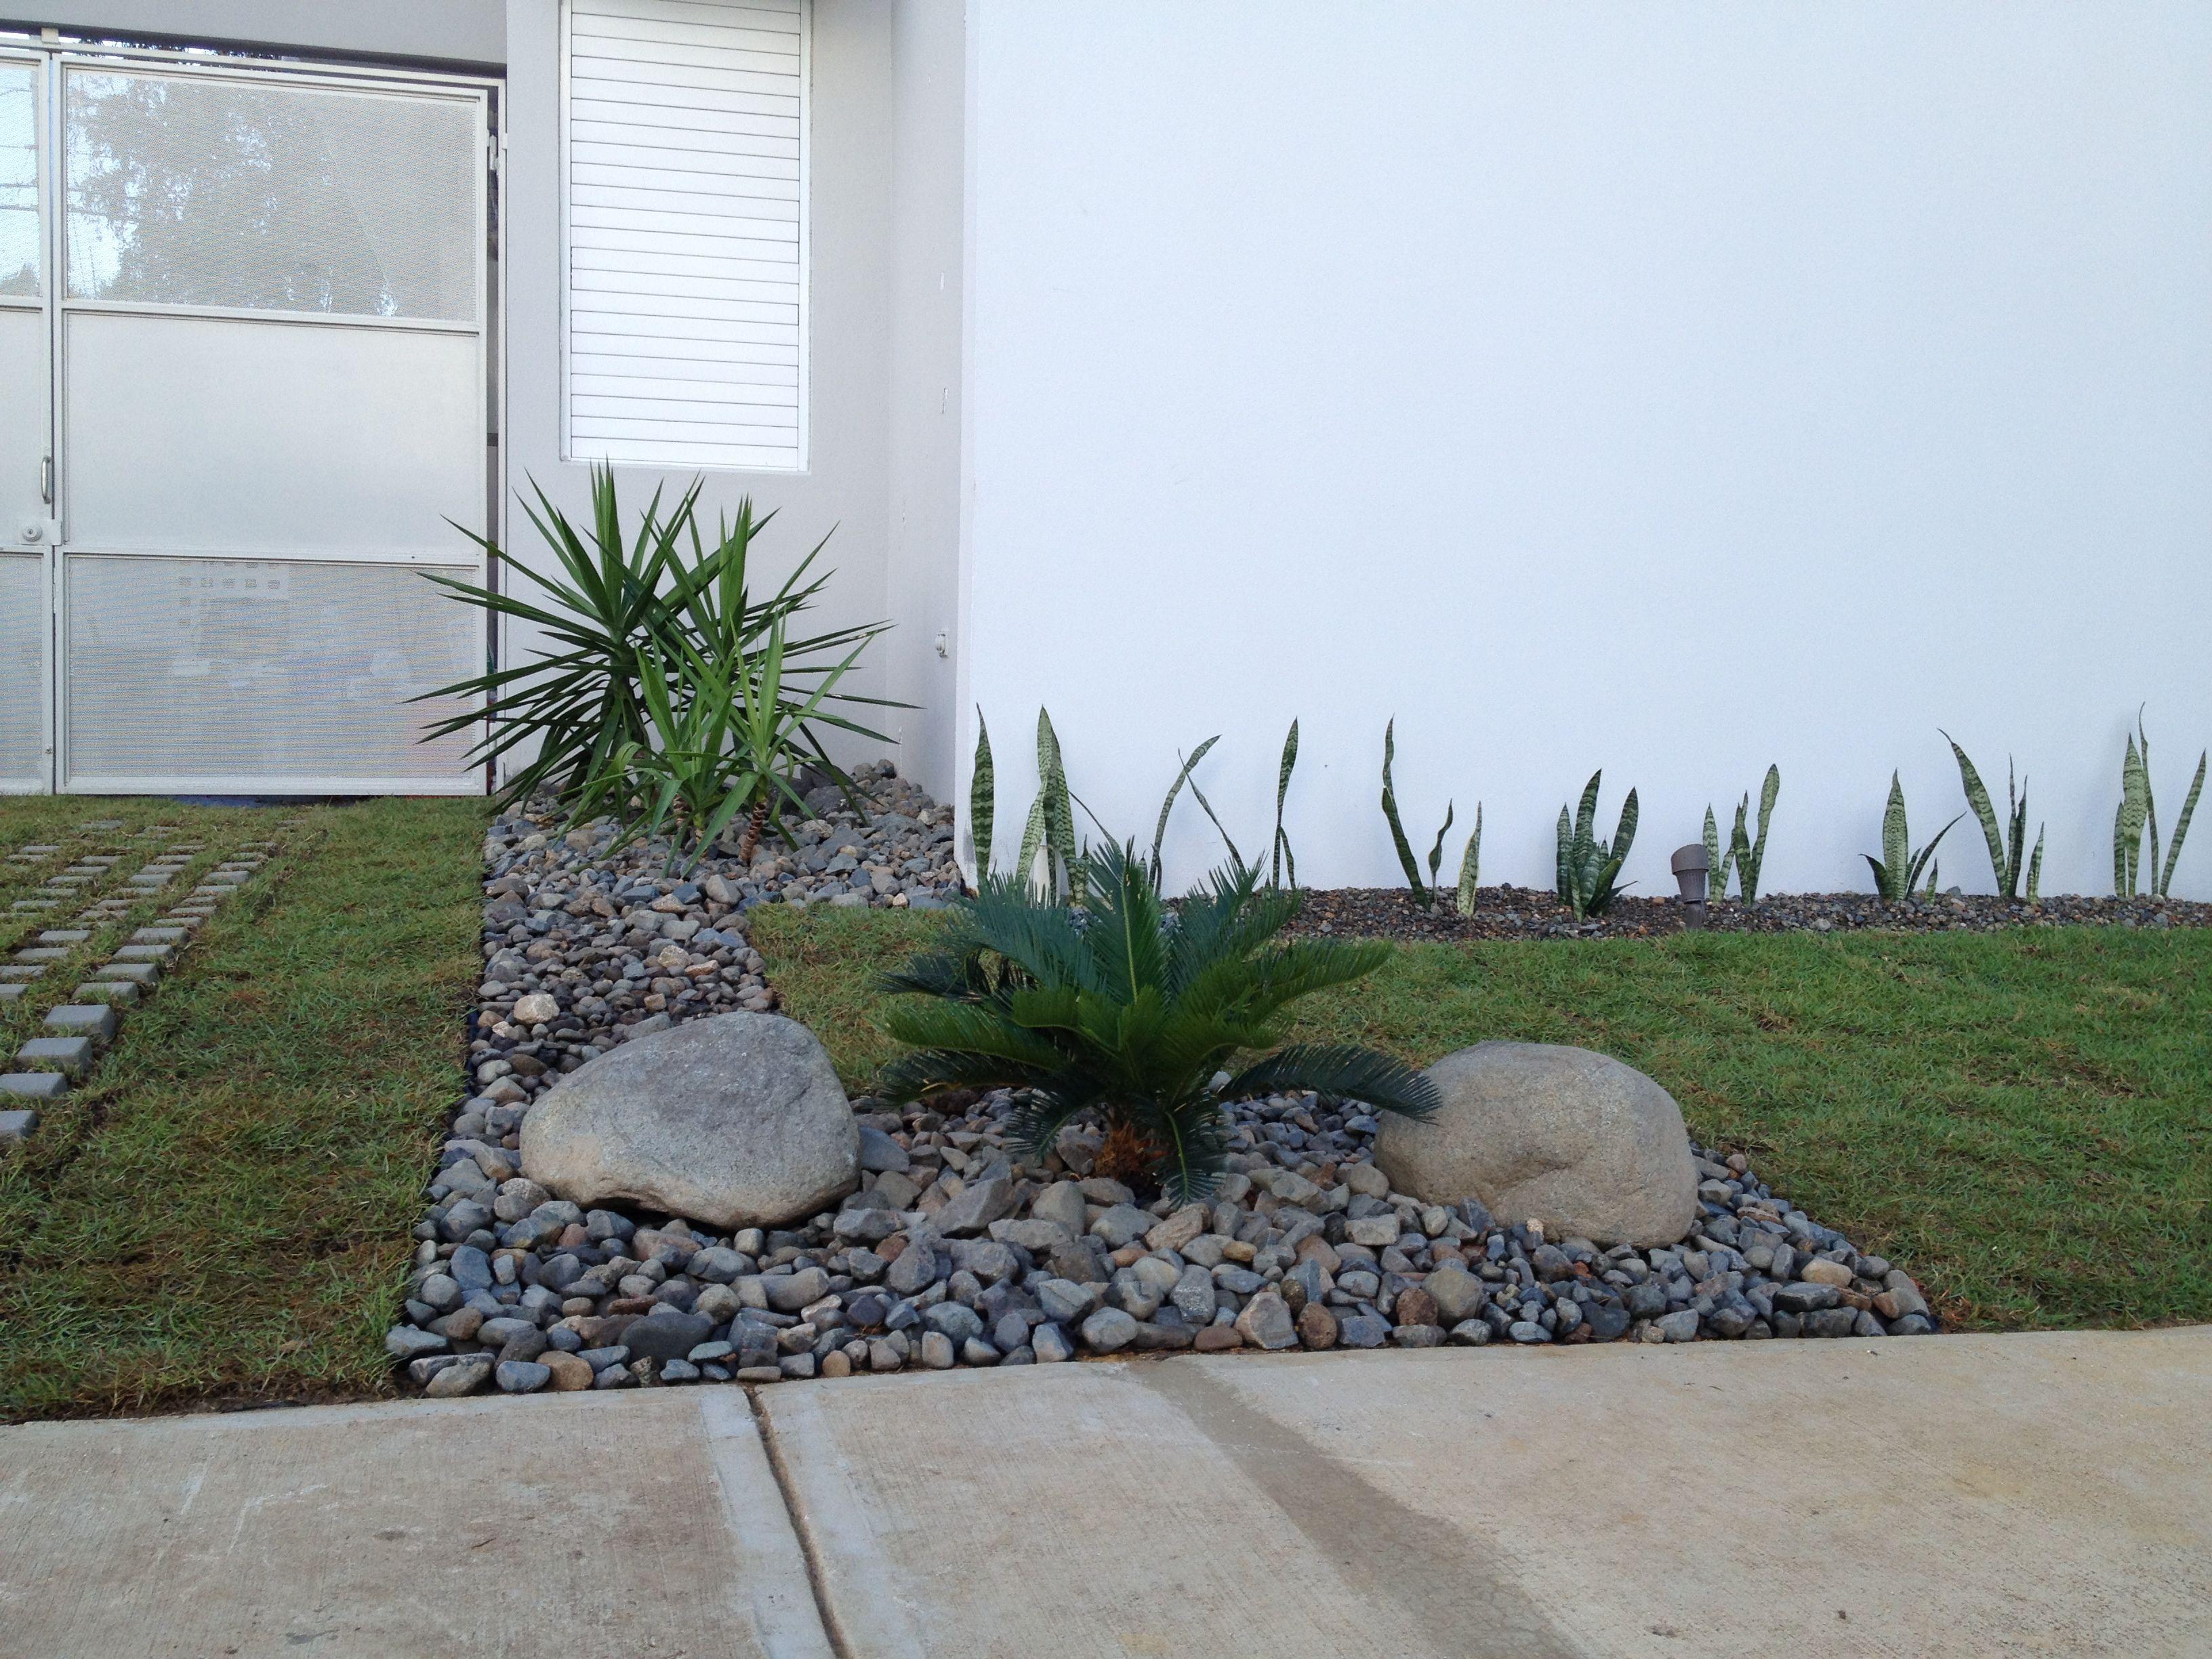 Jardin moderno garden irrigation pr en facebook garden for Jardines modernos